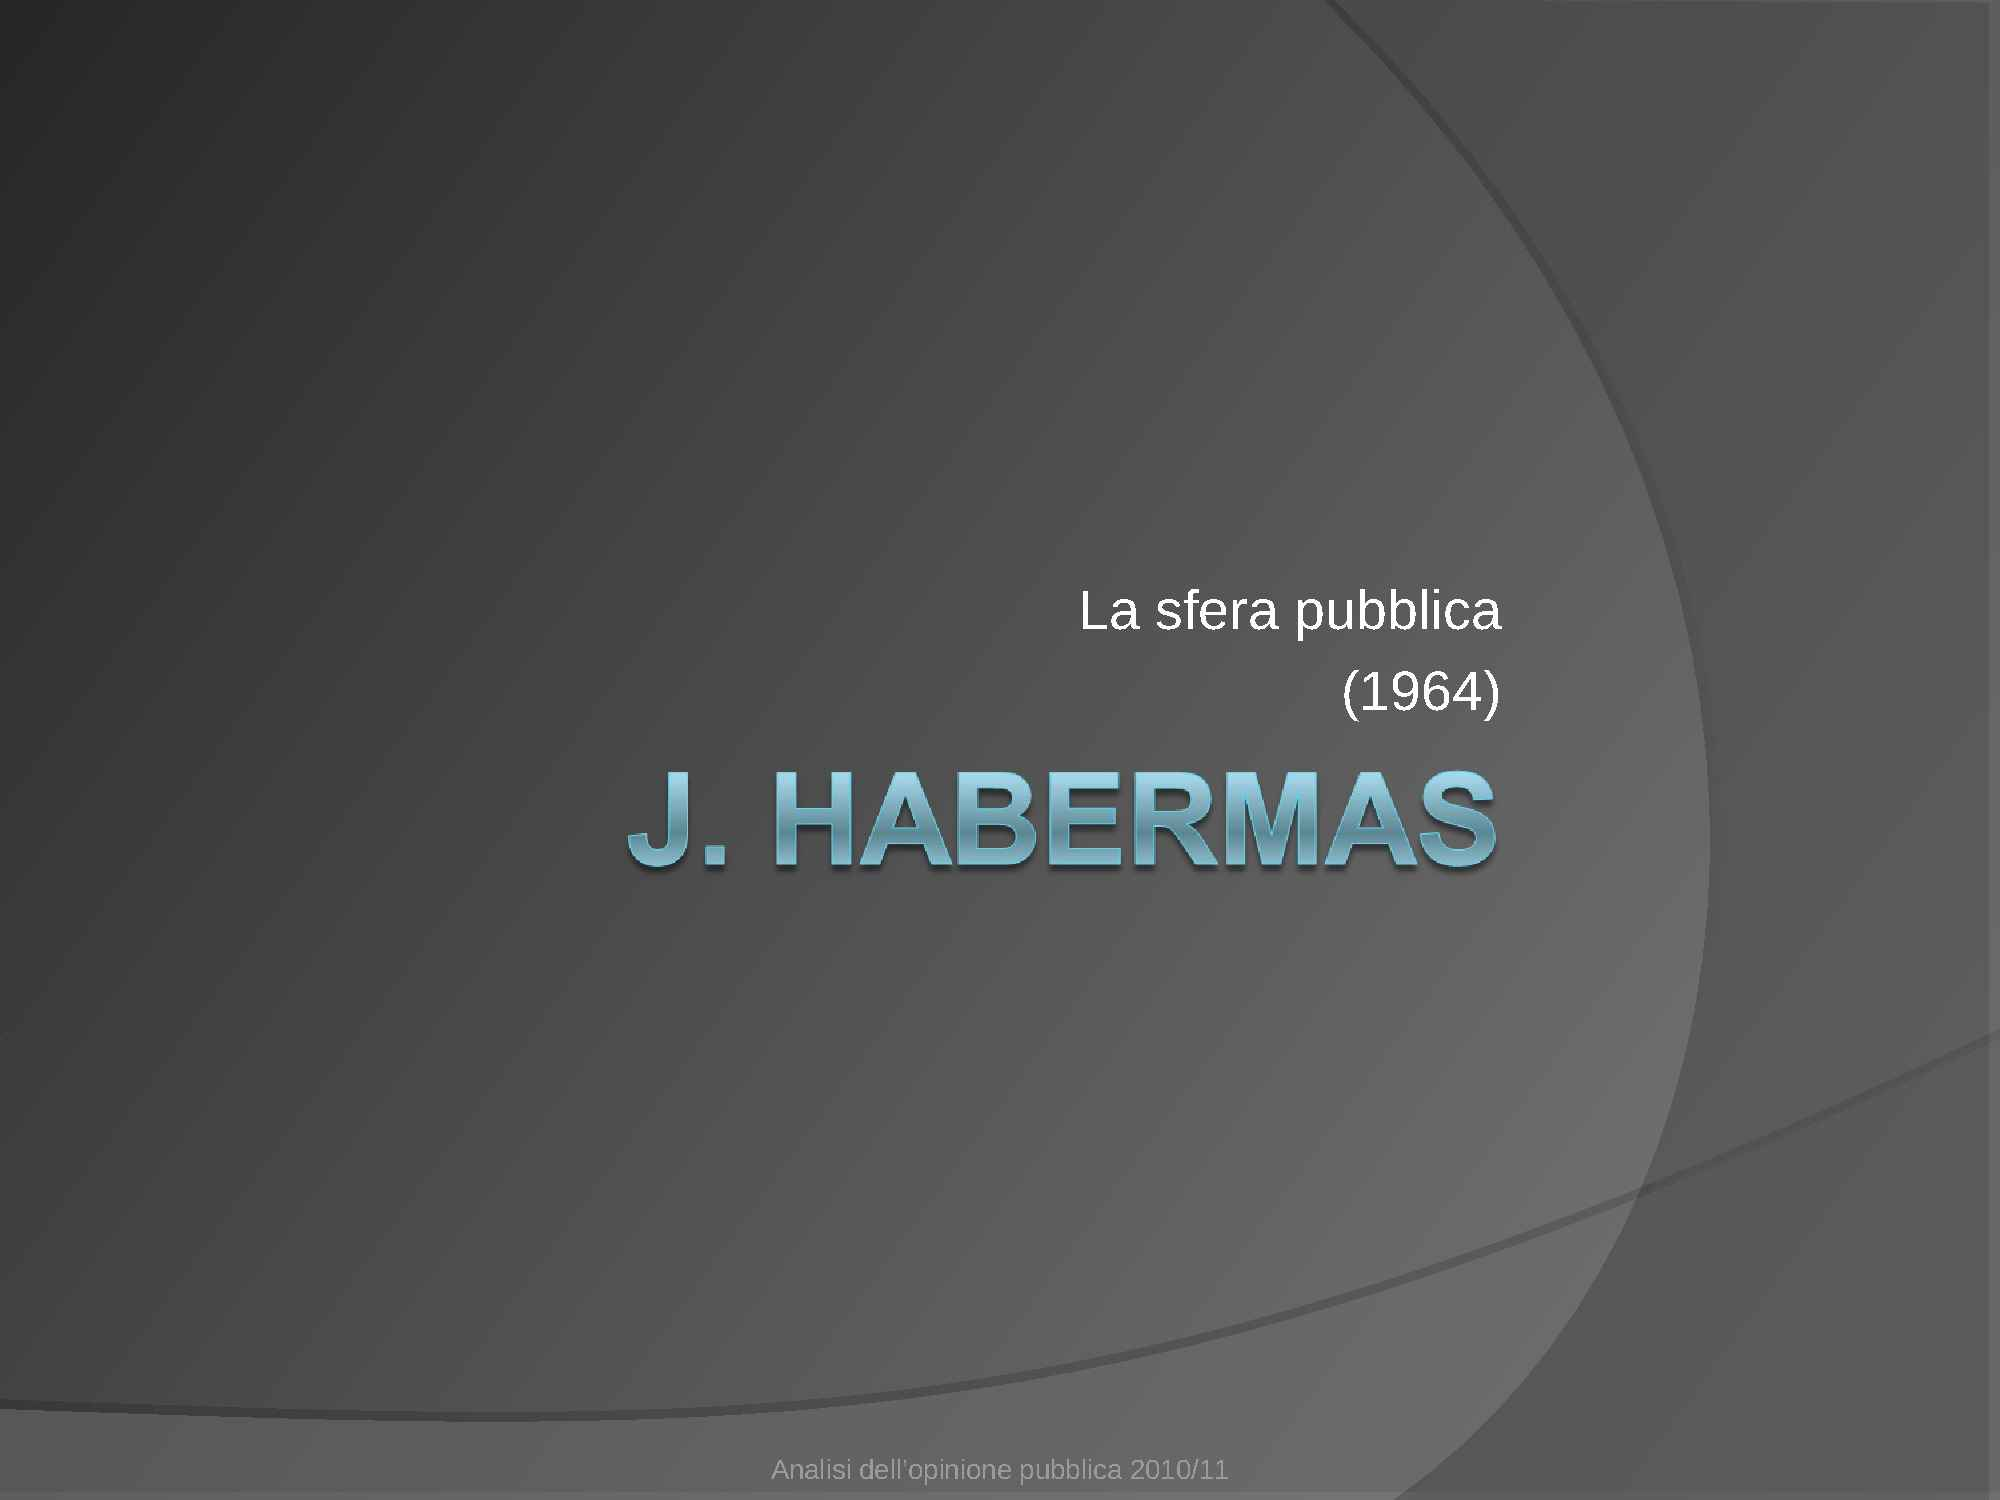 Sfera pubblica - Habermas